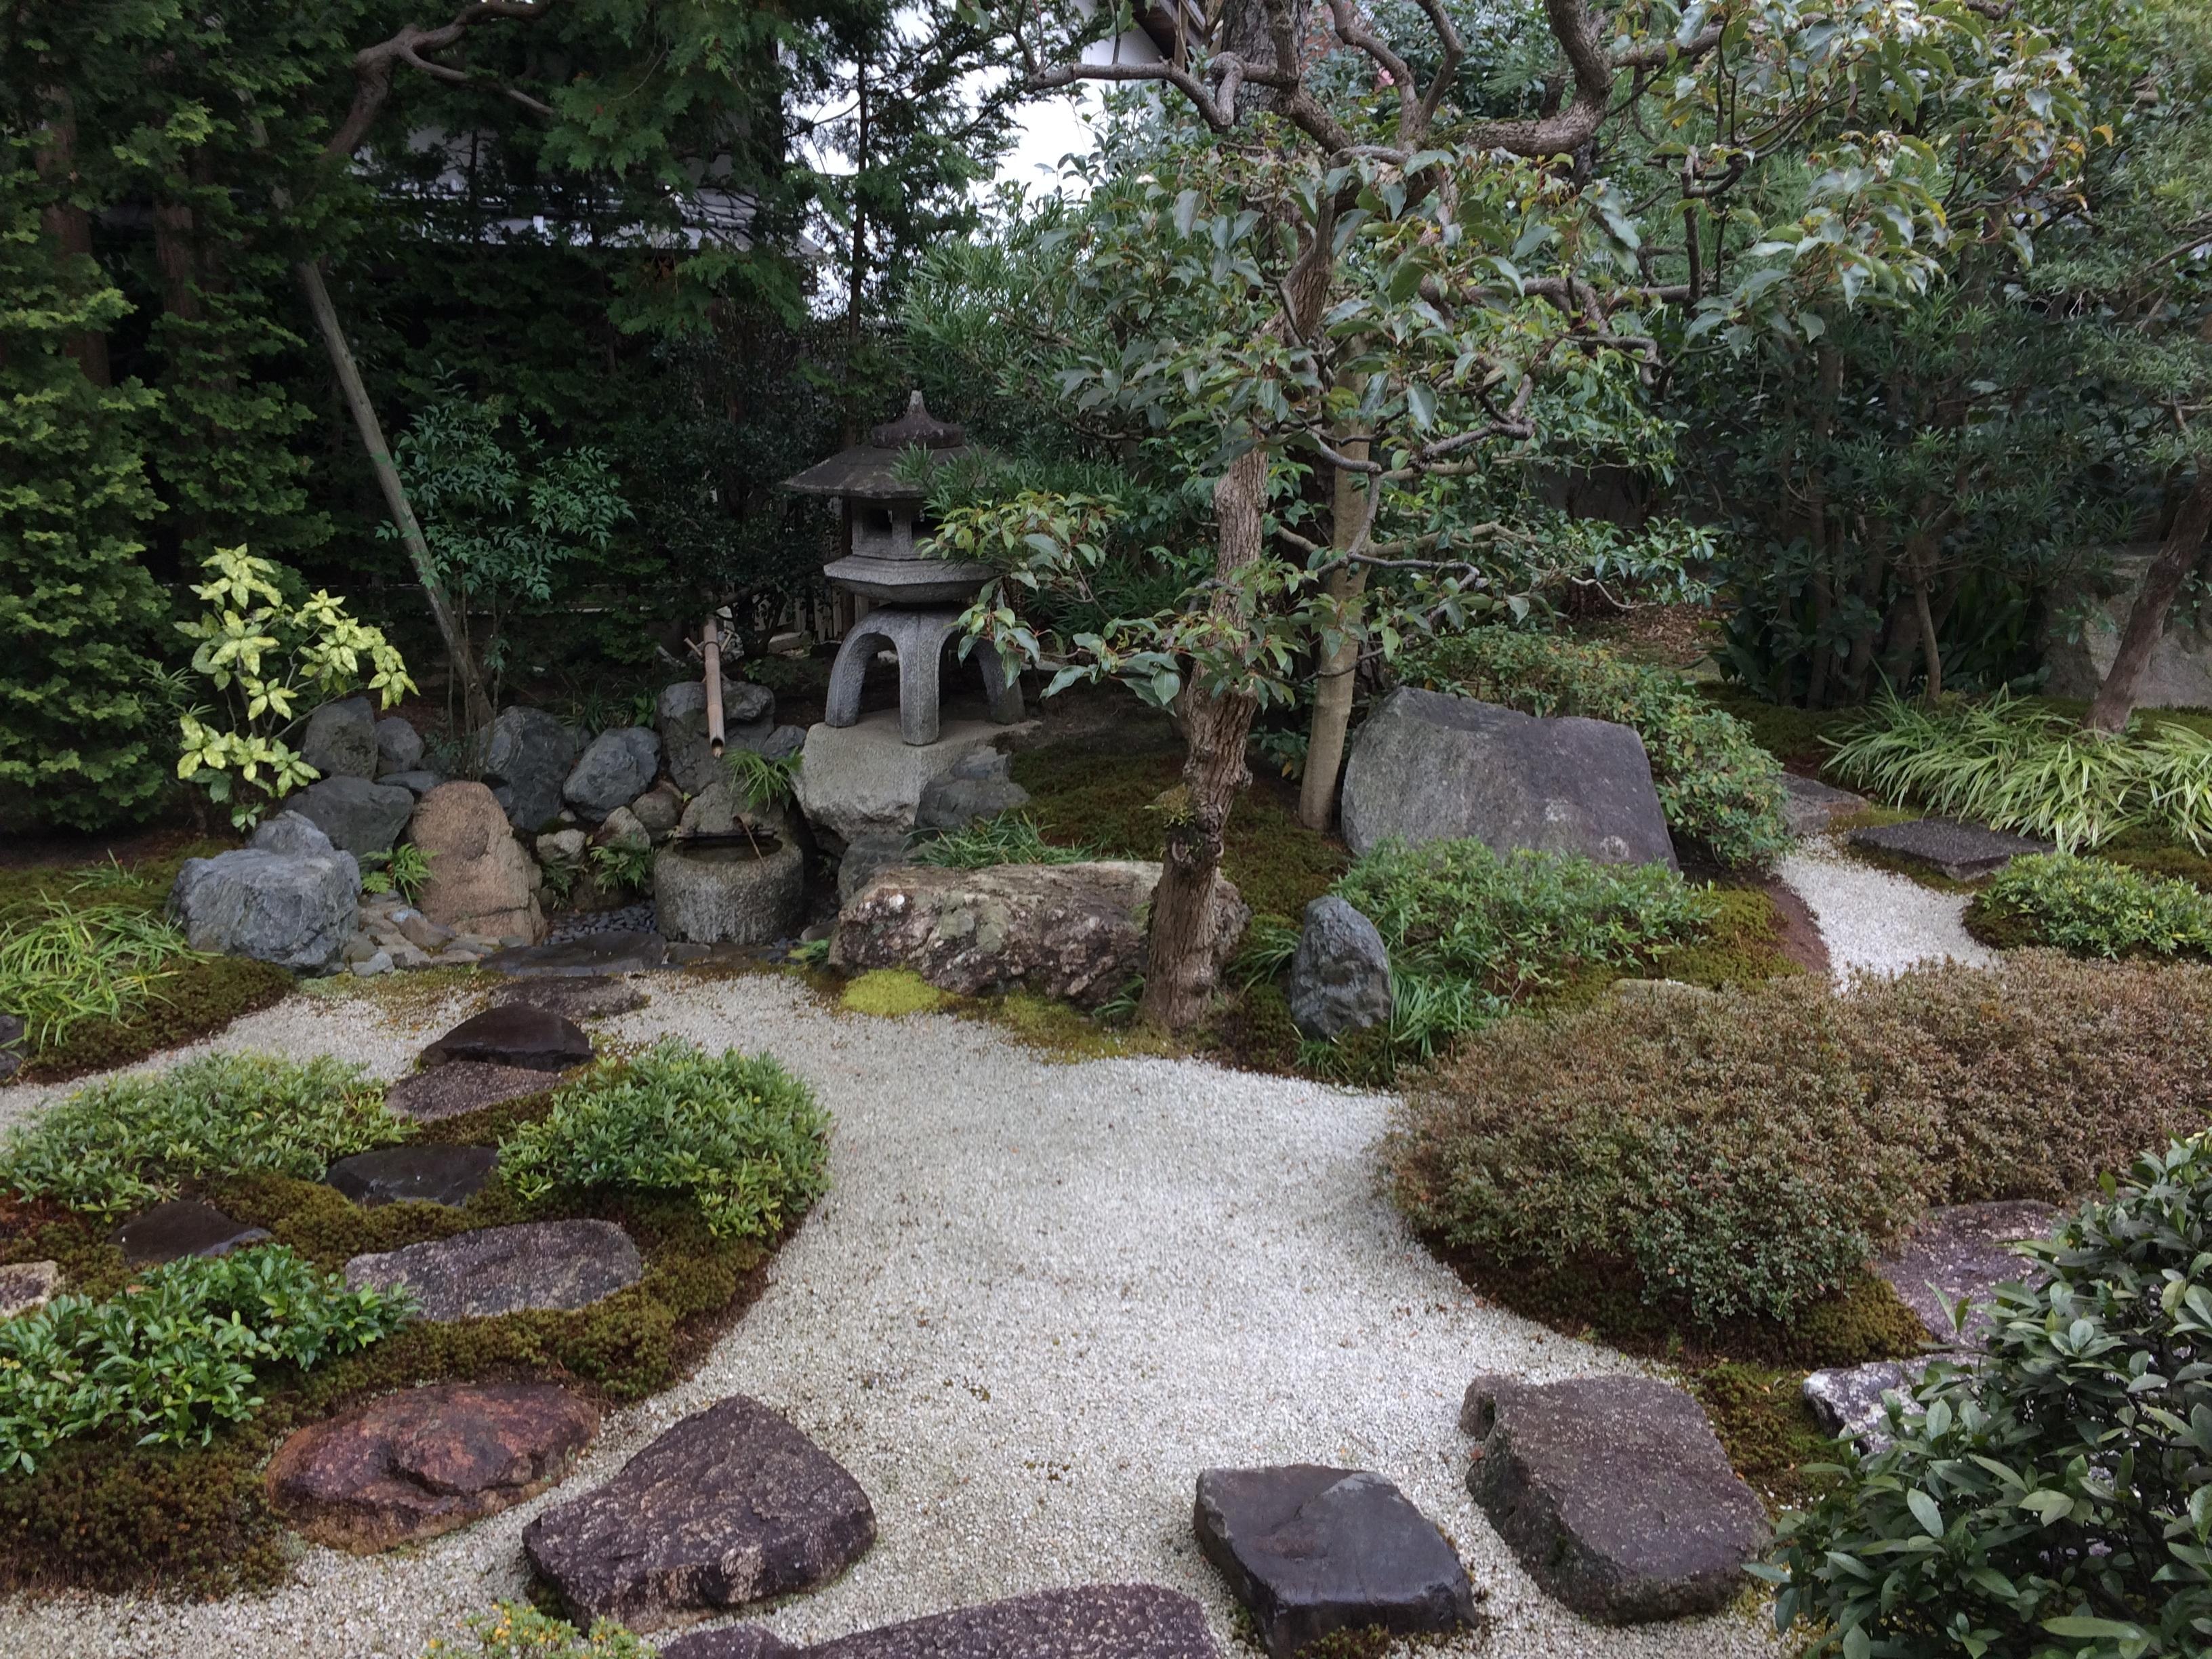 Landscape Outdoor Lawn Stone Walkway Pond Backyard Garden Japan Botanical Japanese  Garden Landscaping Meditation Japanese Yard